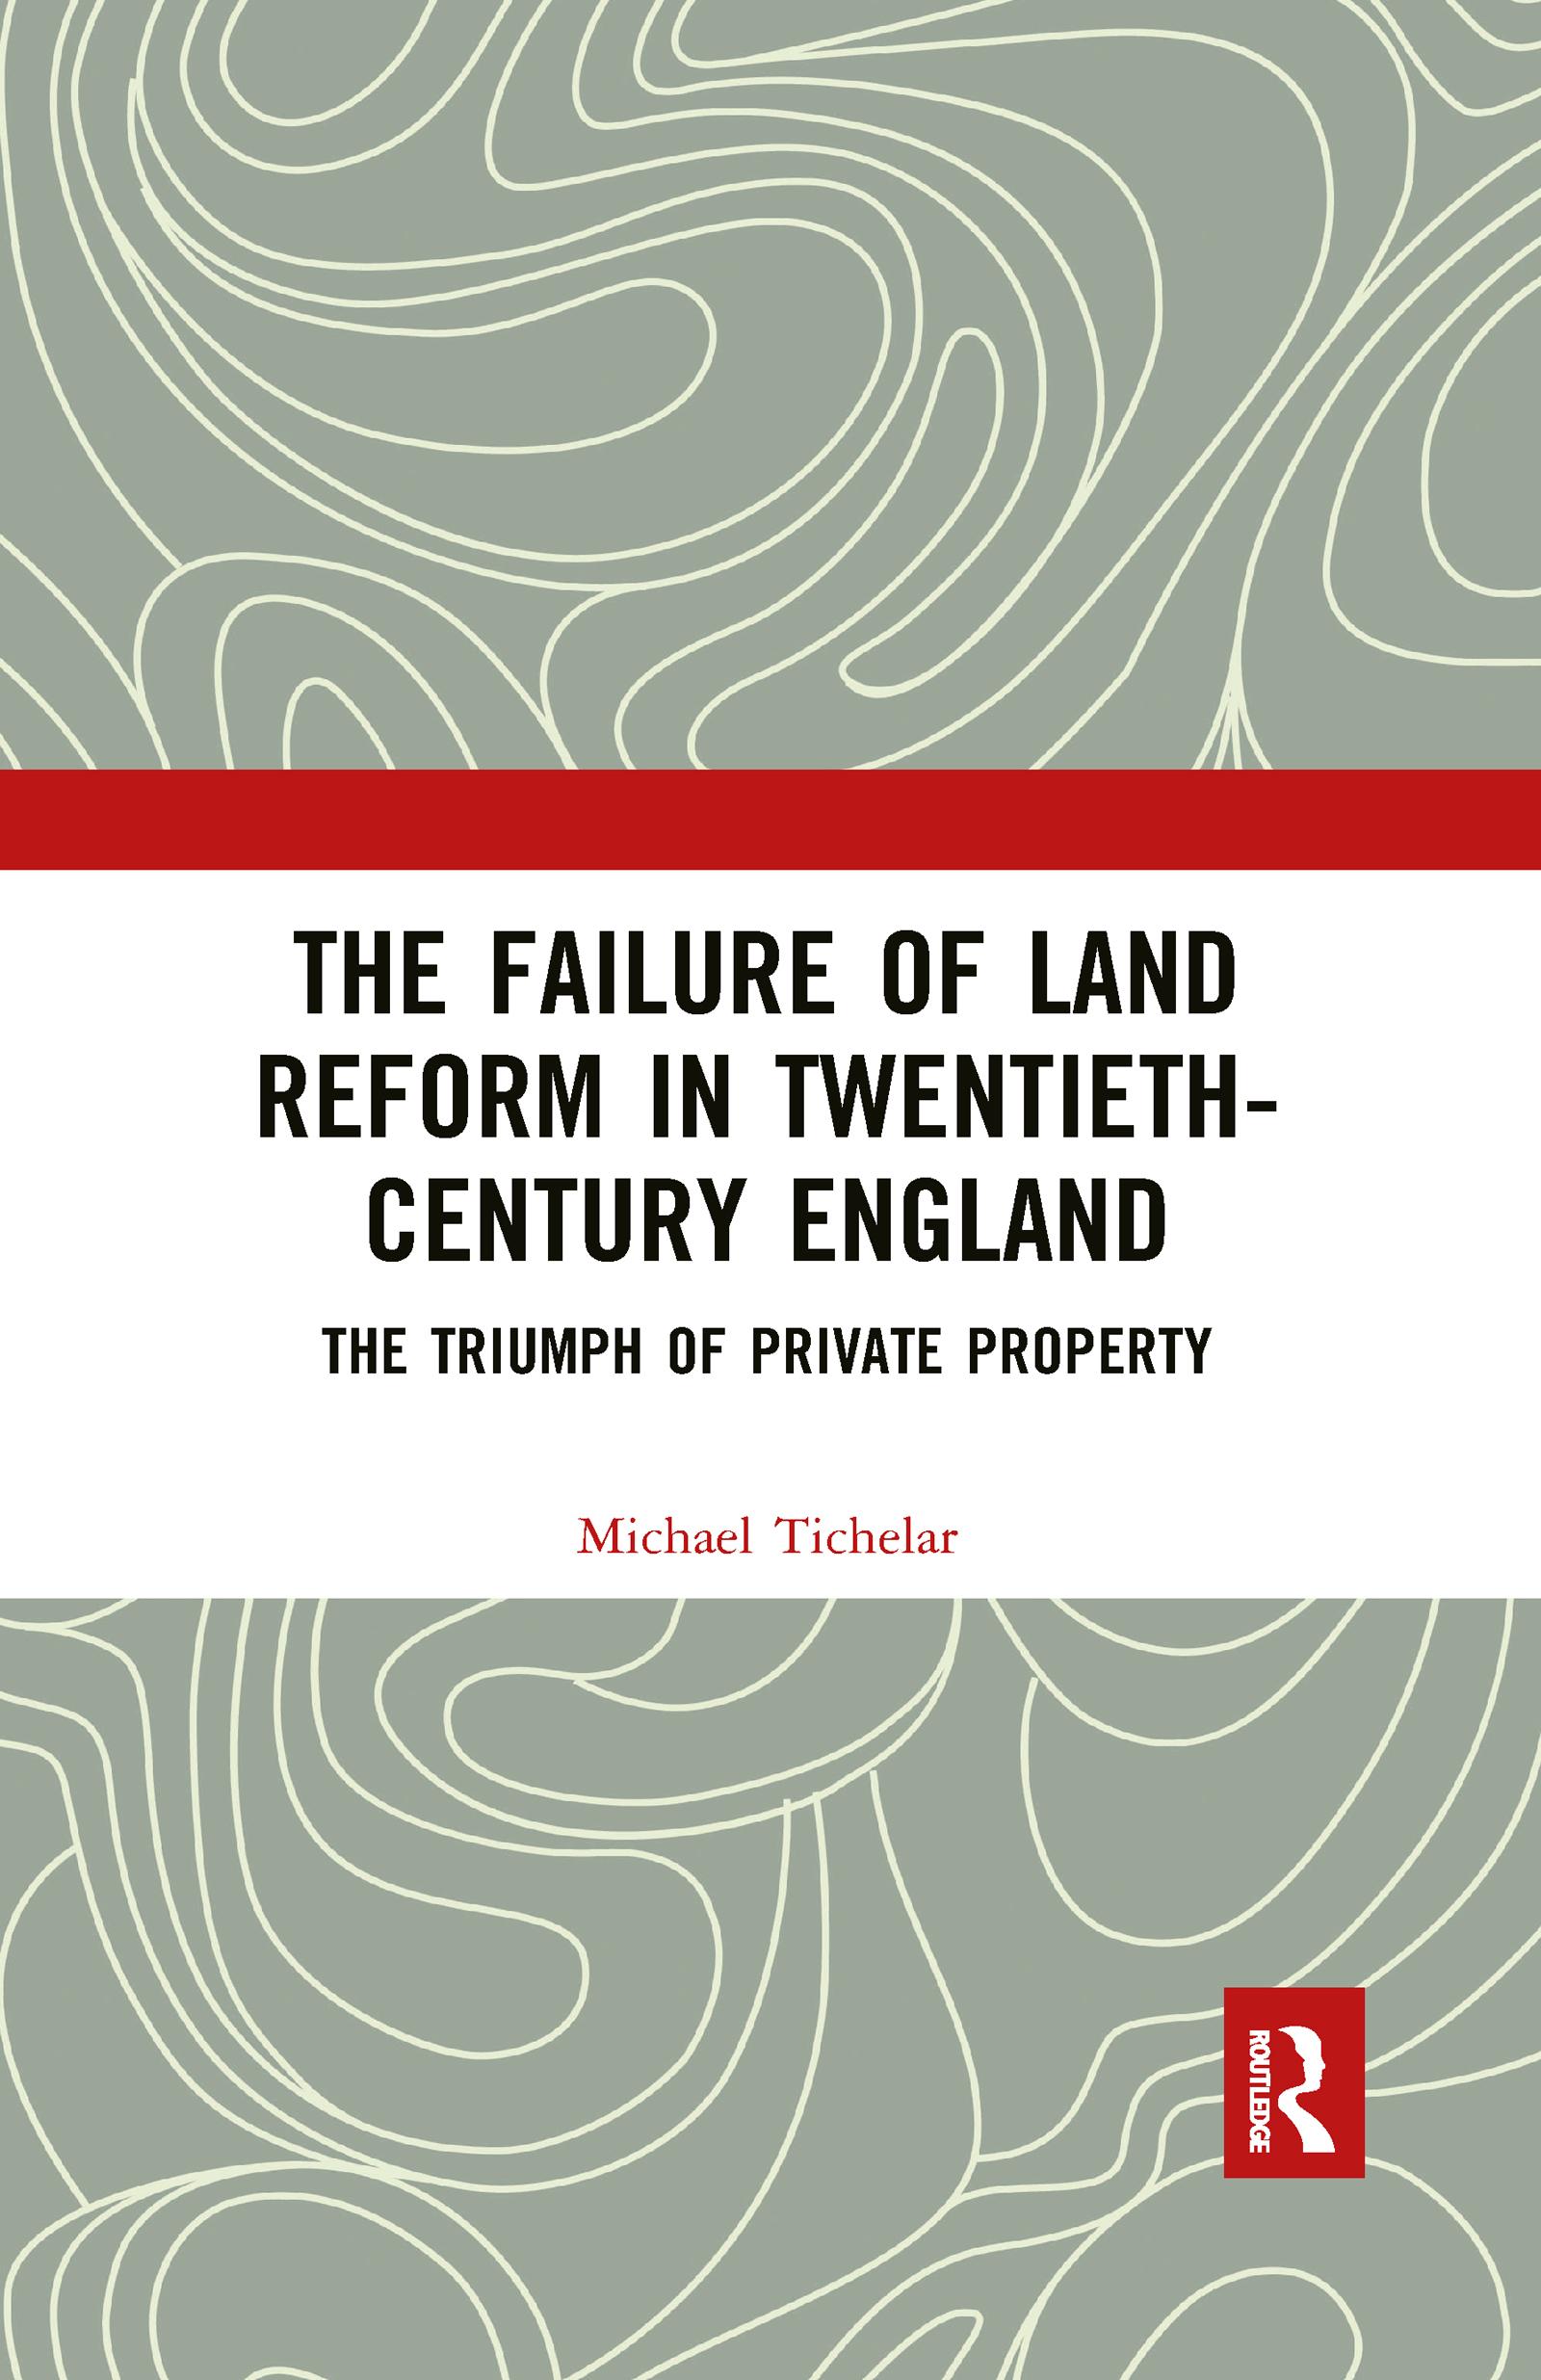 The Failure of Land Reform in Twentieth-Century England